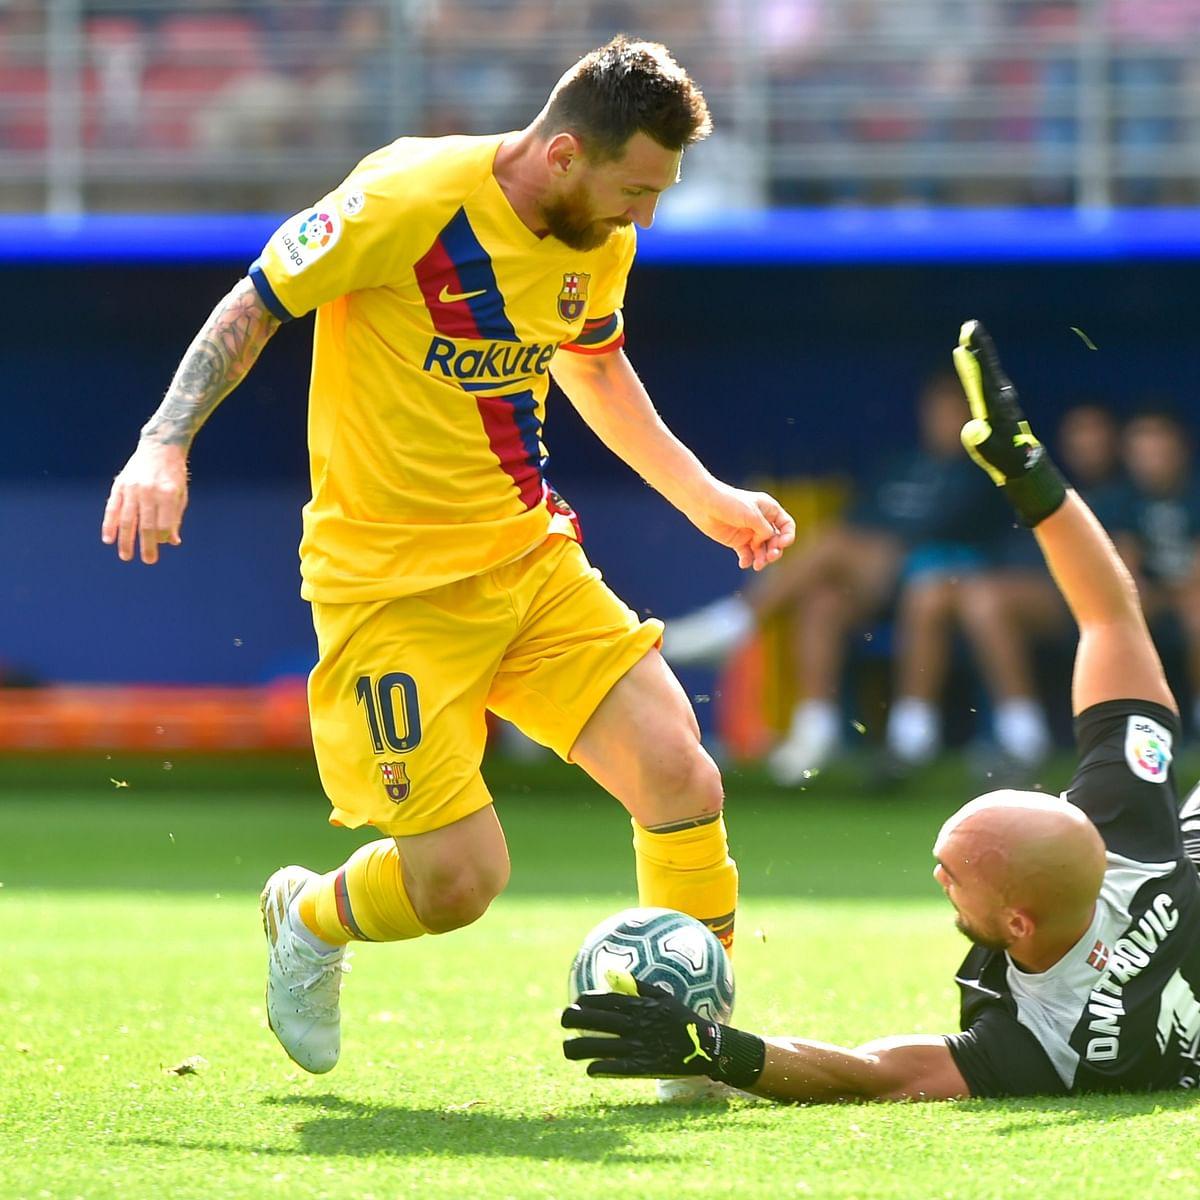 La Liga: Real Madrid beaten by Barcelona